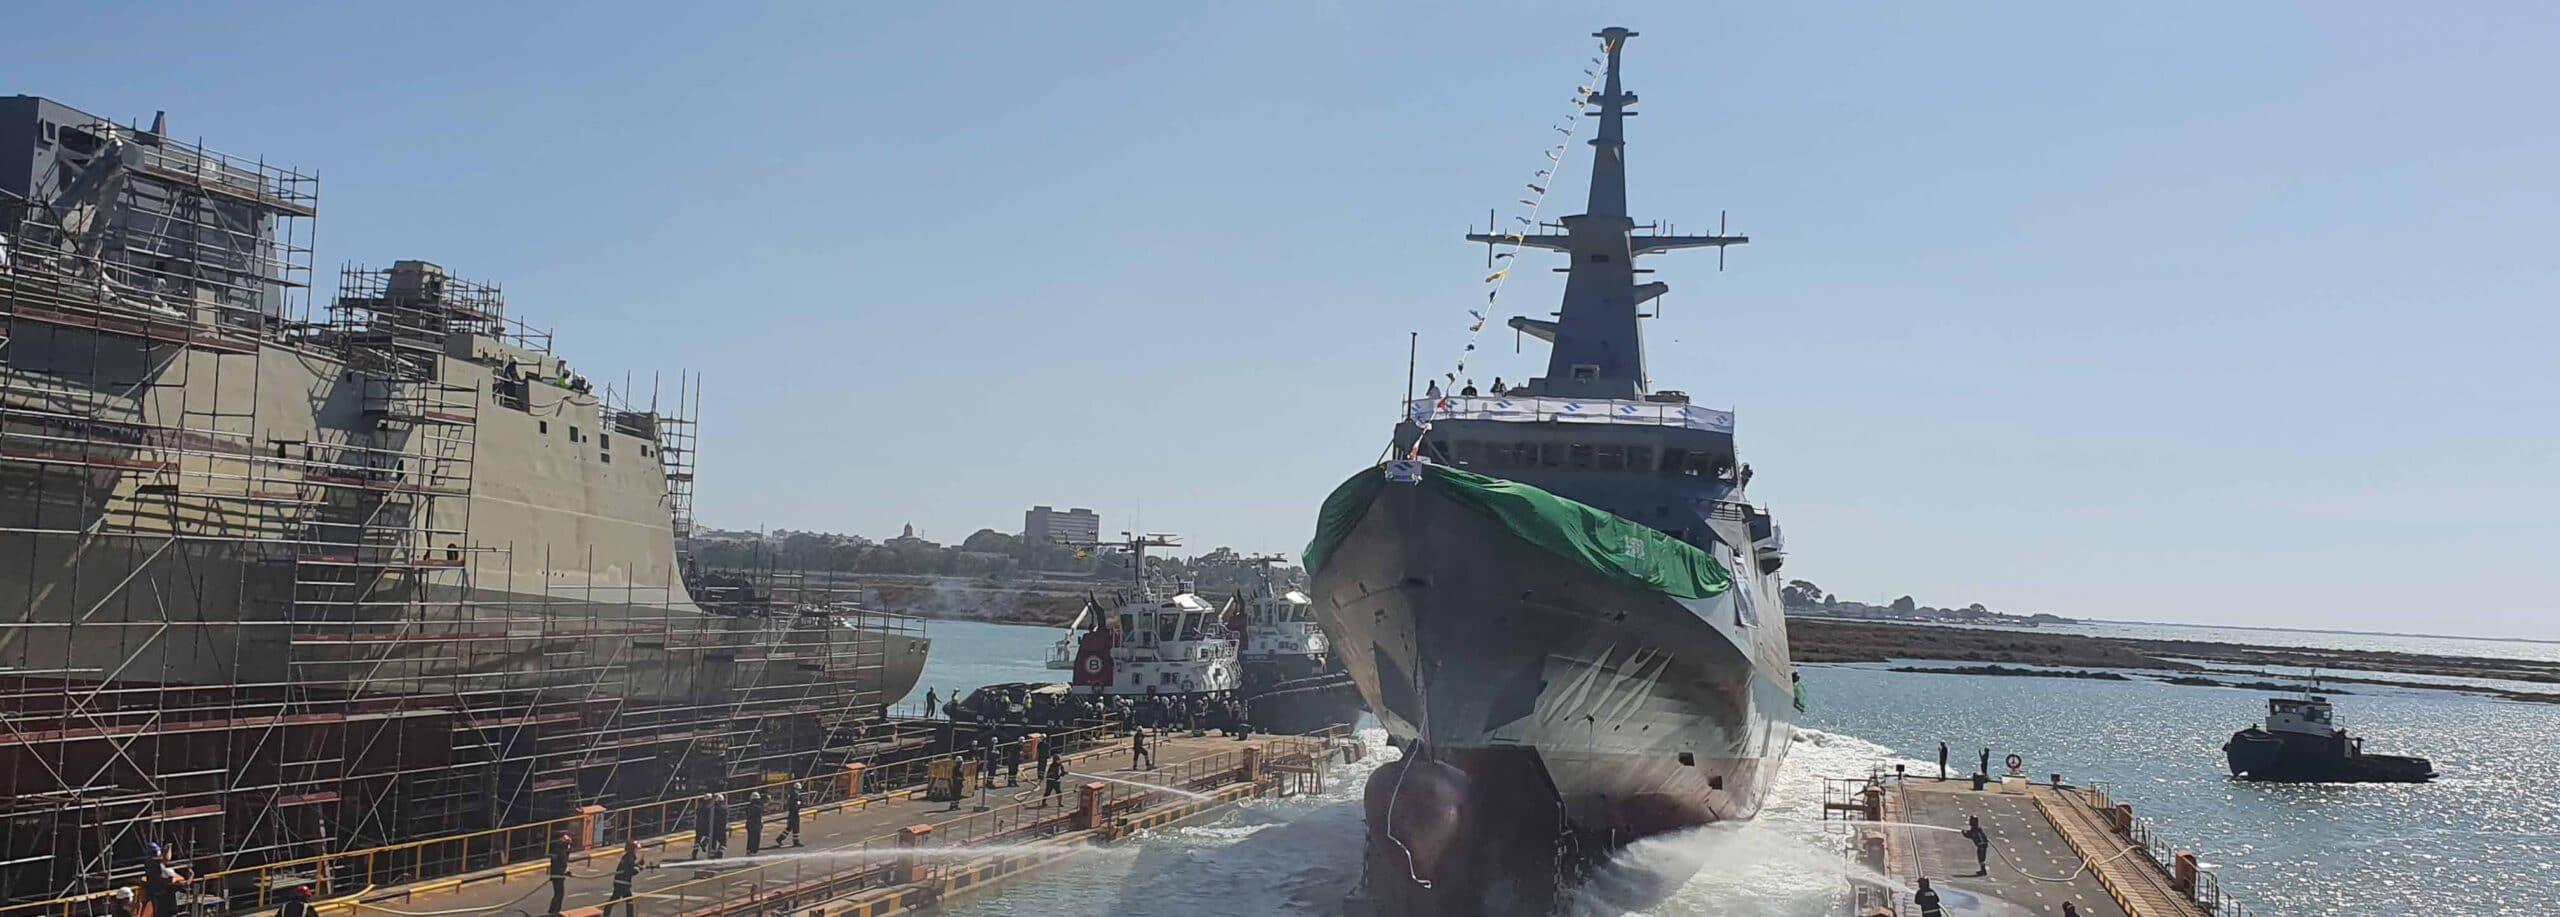 al jubail navantia scaled - naval post- naval news and information